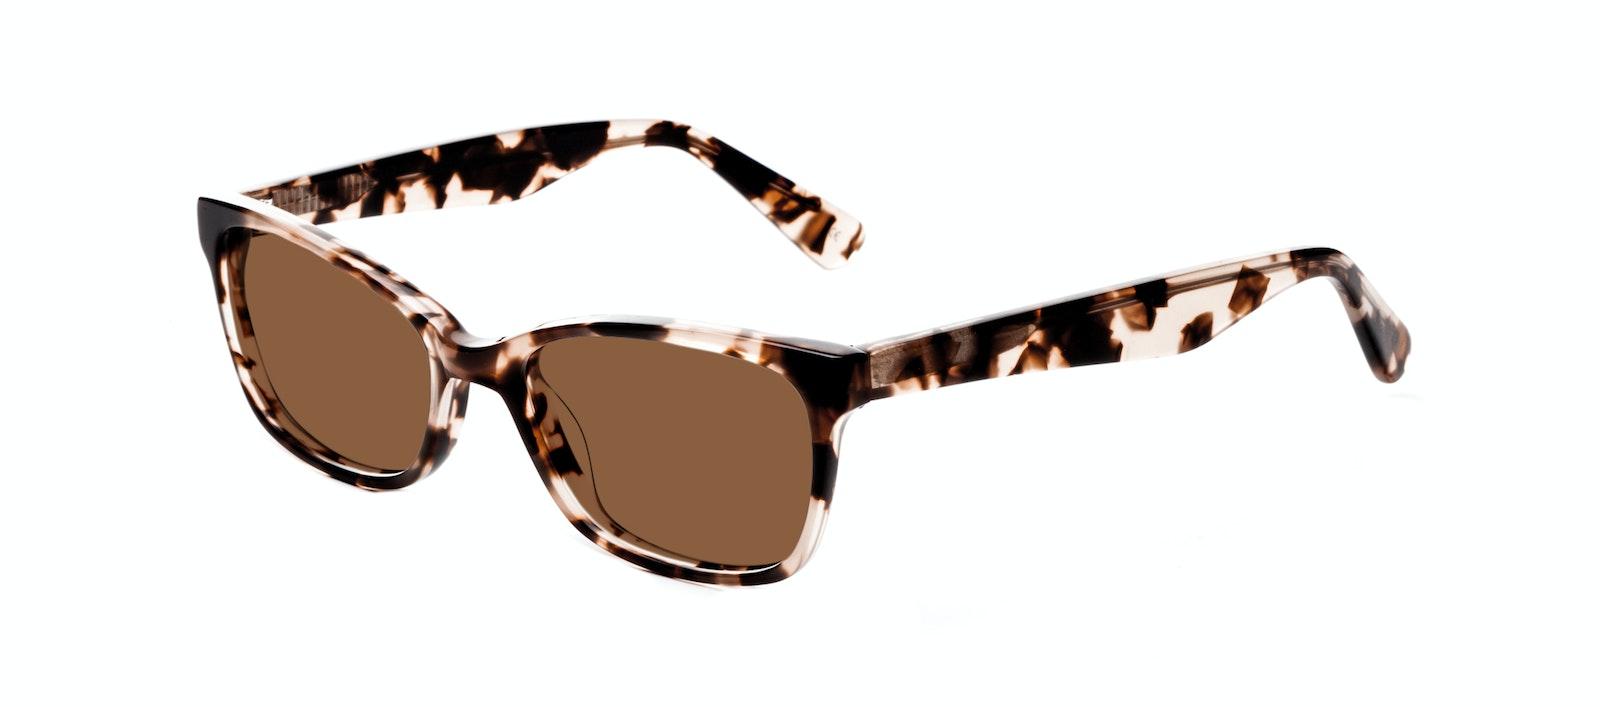 Affordable Fashion Glasses Cat Eye Rectangle Square Sunglasses Women Comet Pink Tortoise Tilt